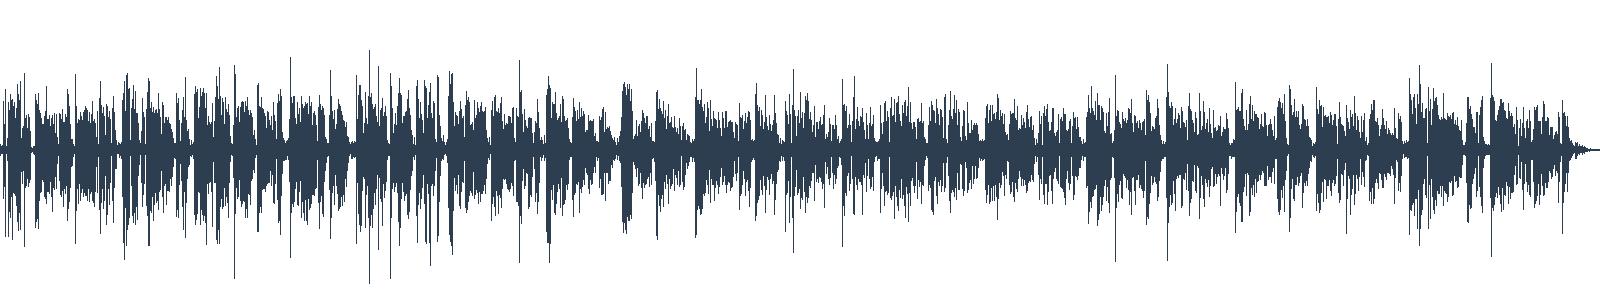 Nové audioknihy 13/2019 waveform